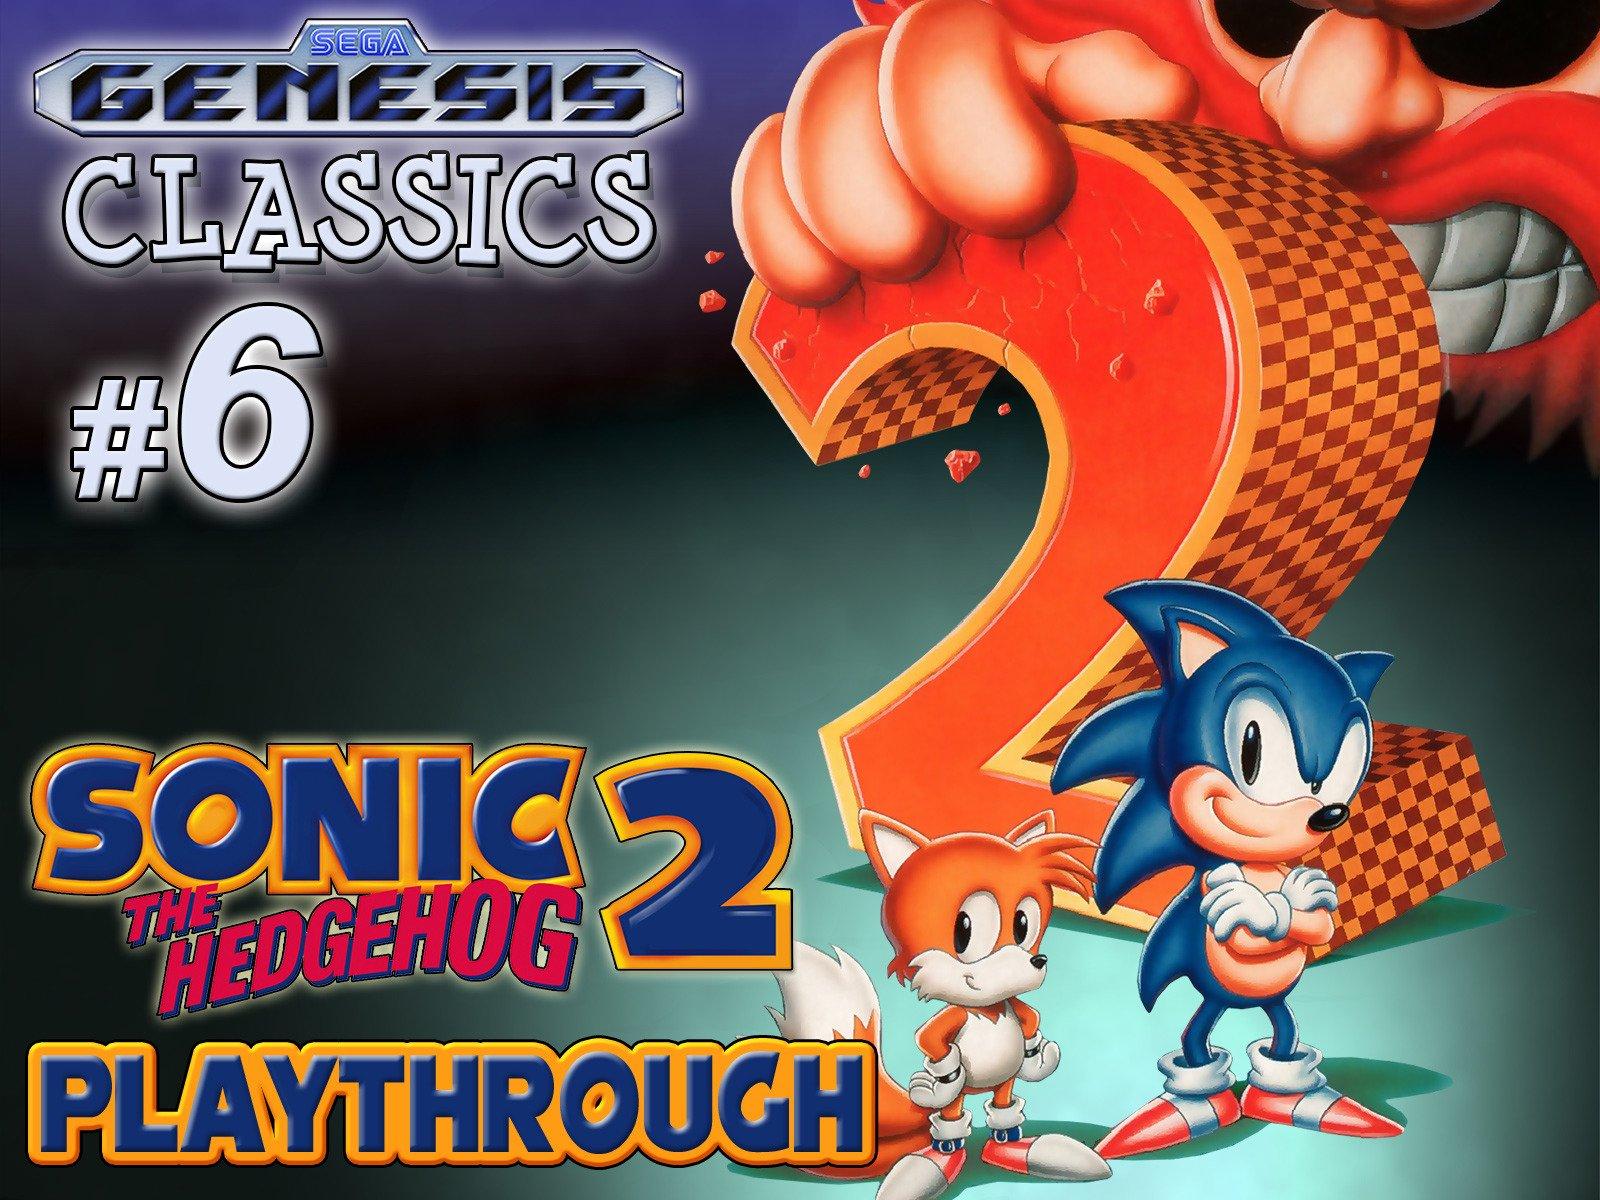 Clip: Sonic the Hedgehog 2 Playthrough (Genesis Classics 6) - Season 1